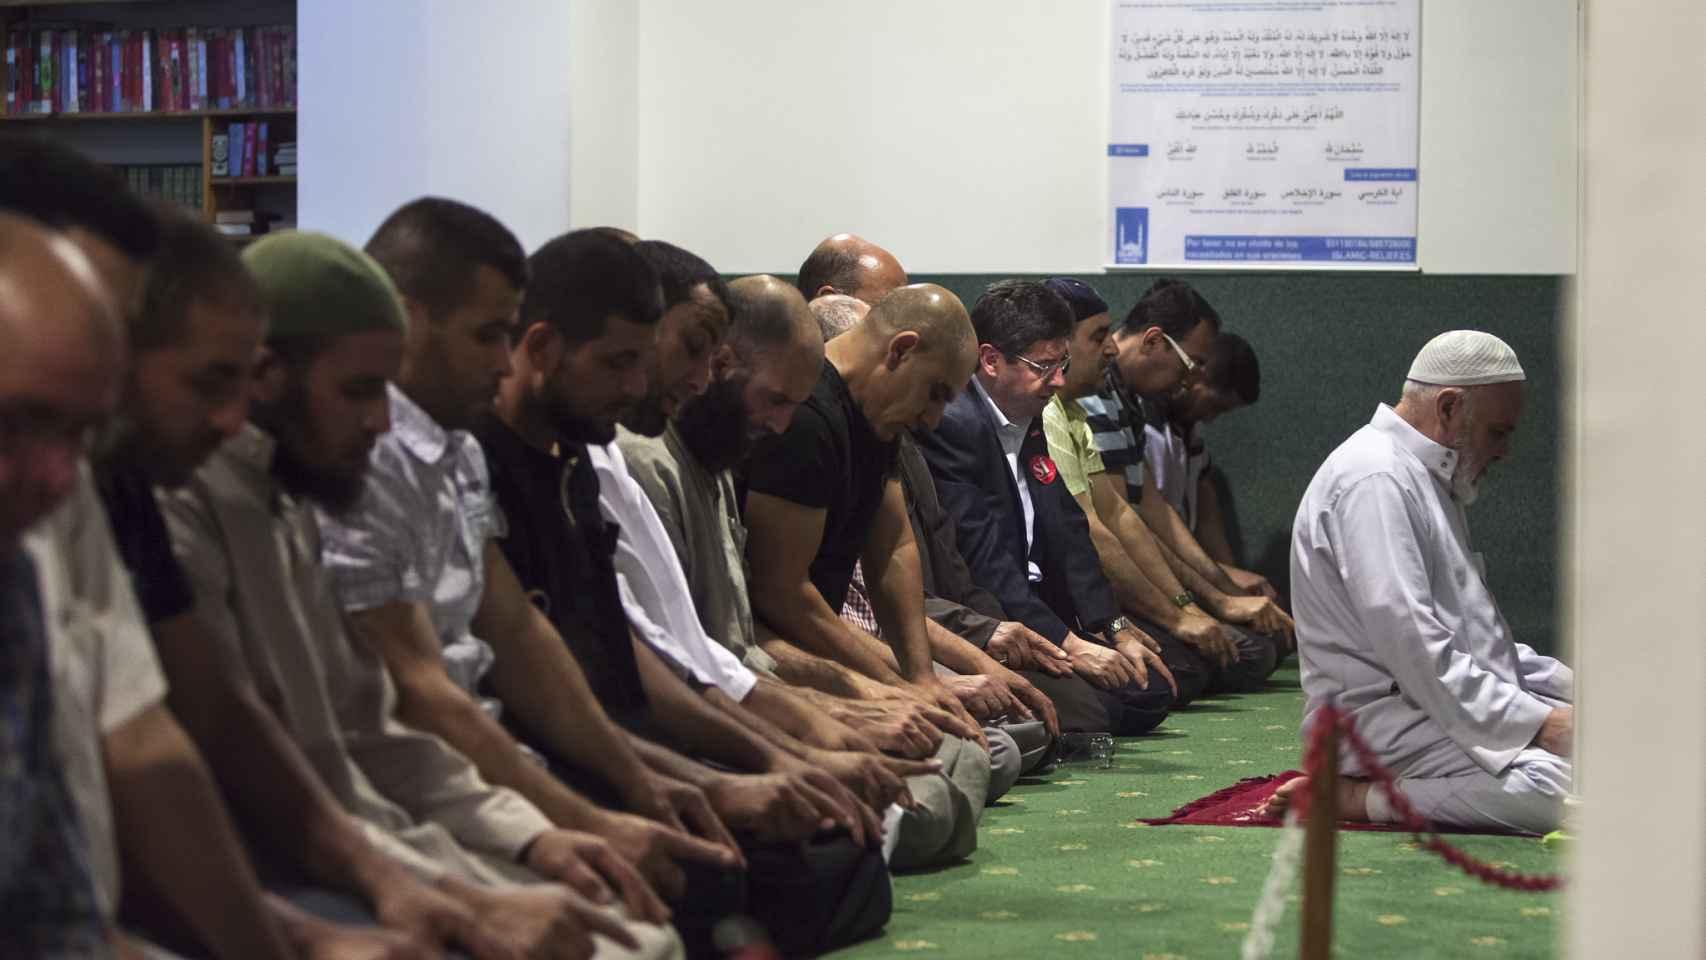 Mohamed Chaib (quinto por la derecha), rezando en la mezquita Omar Ibn El Khatab.